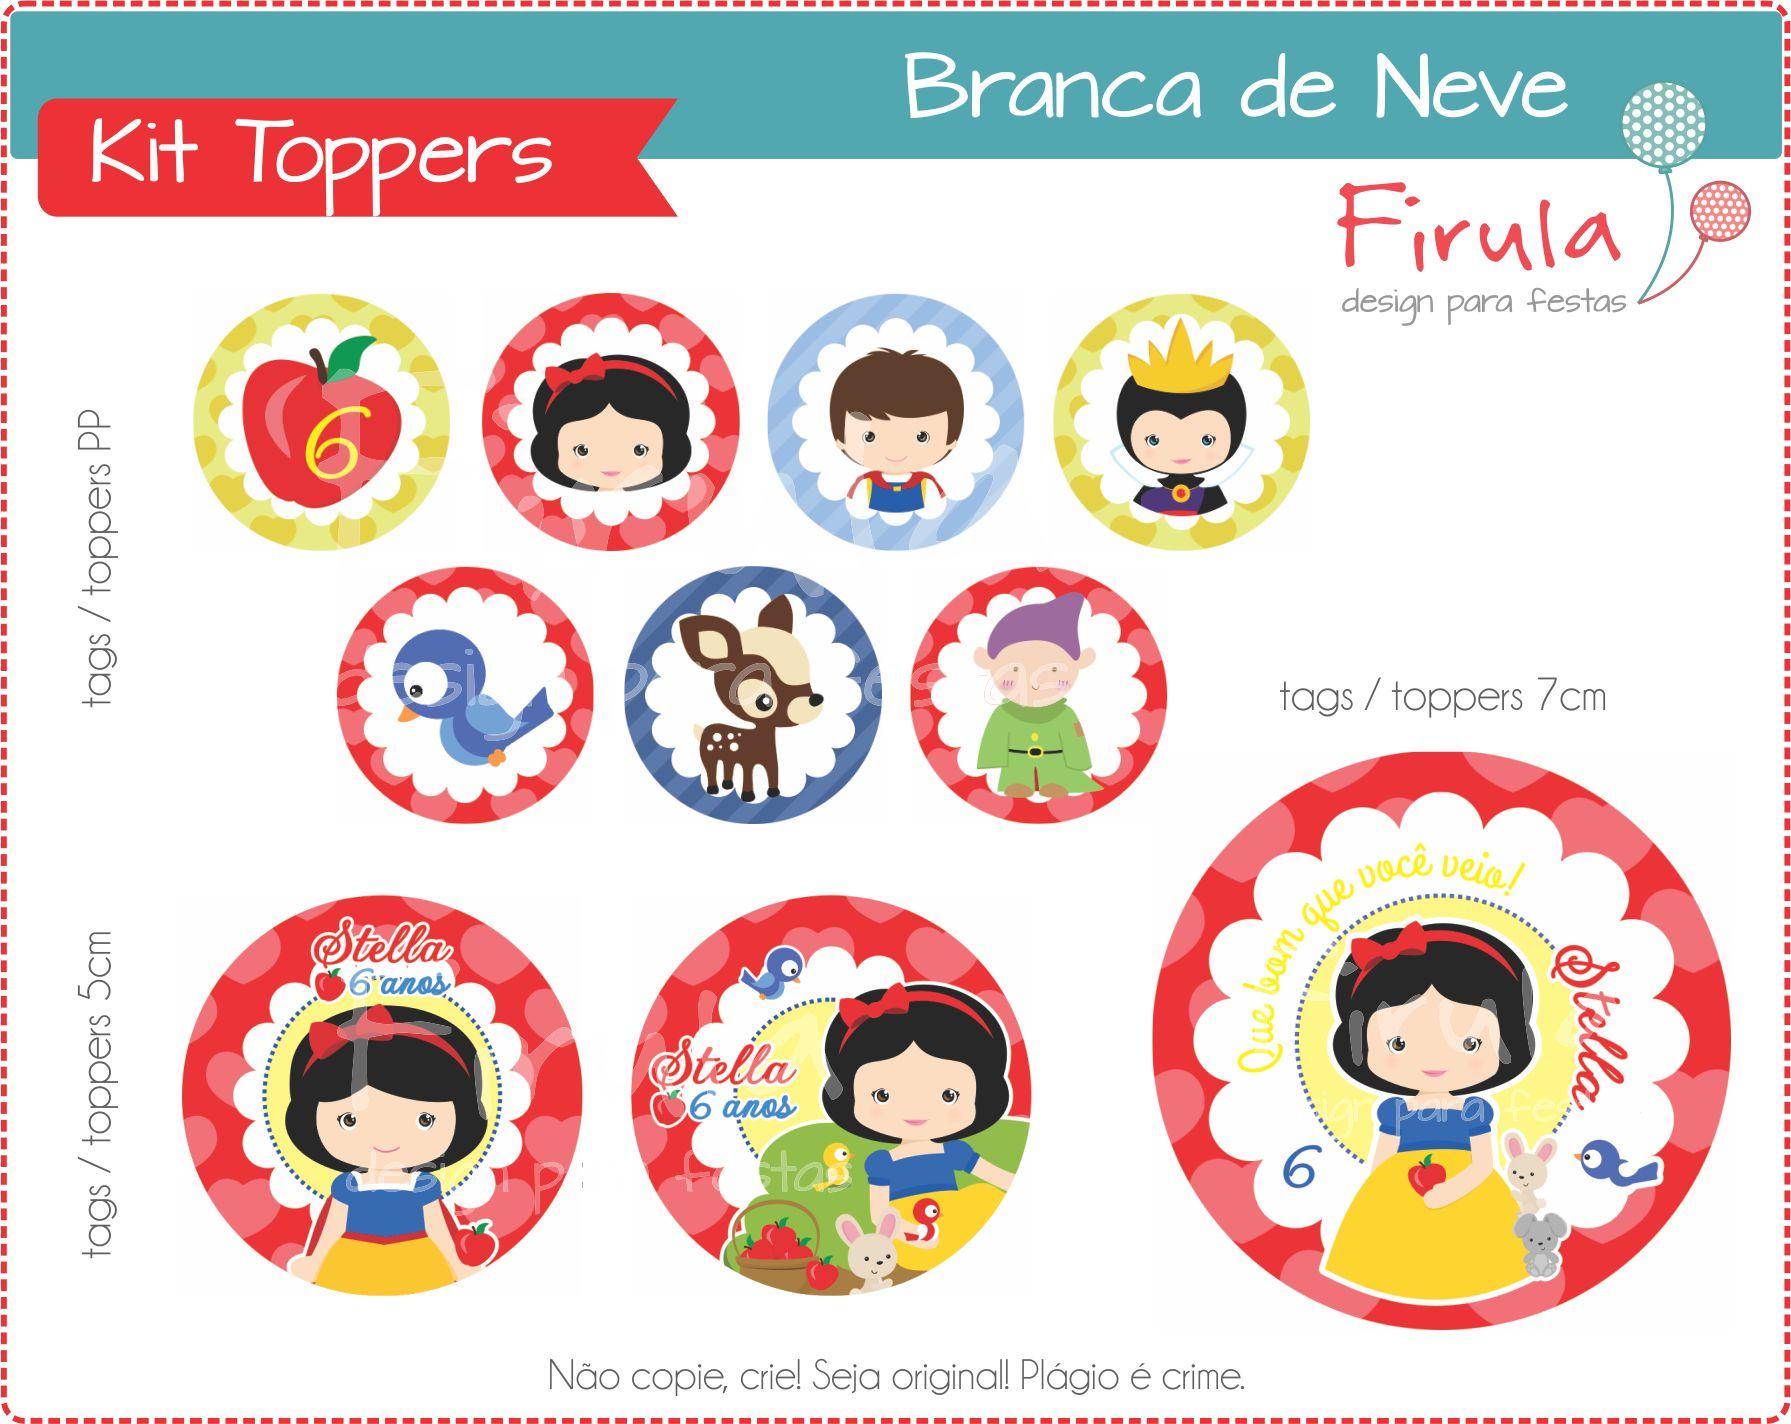 Kit Toppers Tags Branca De Neve Verm No Elo7 Firula Festas